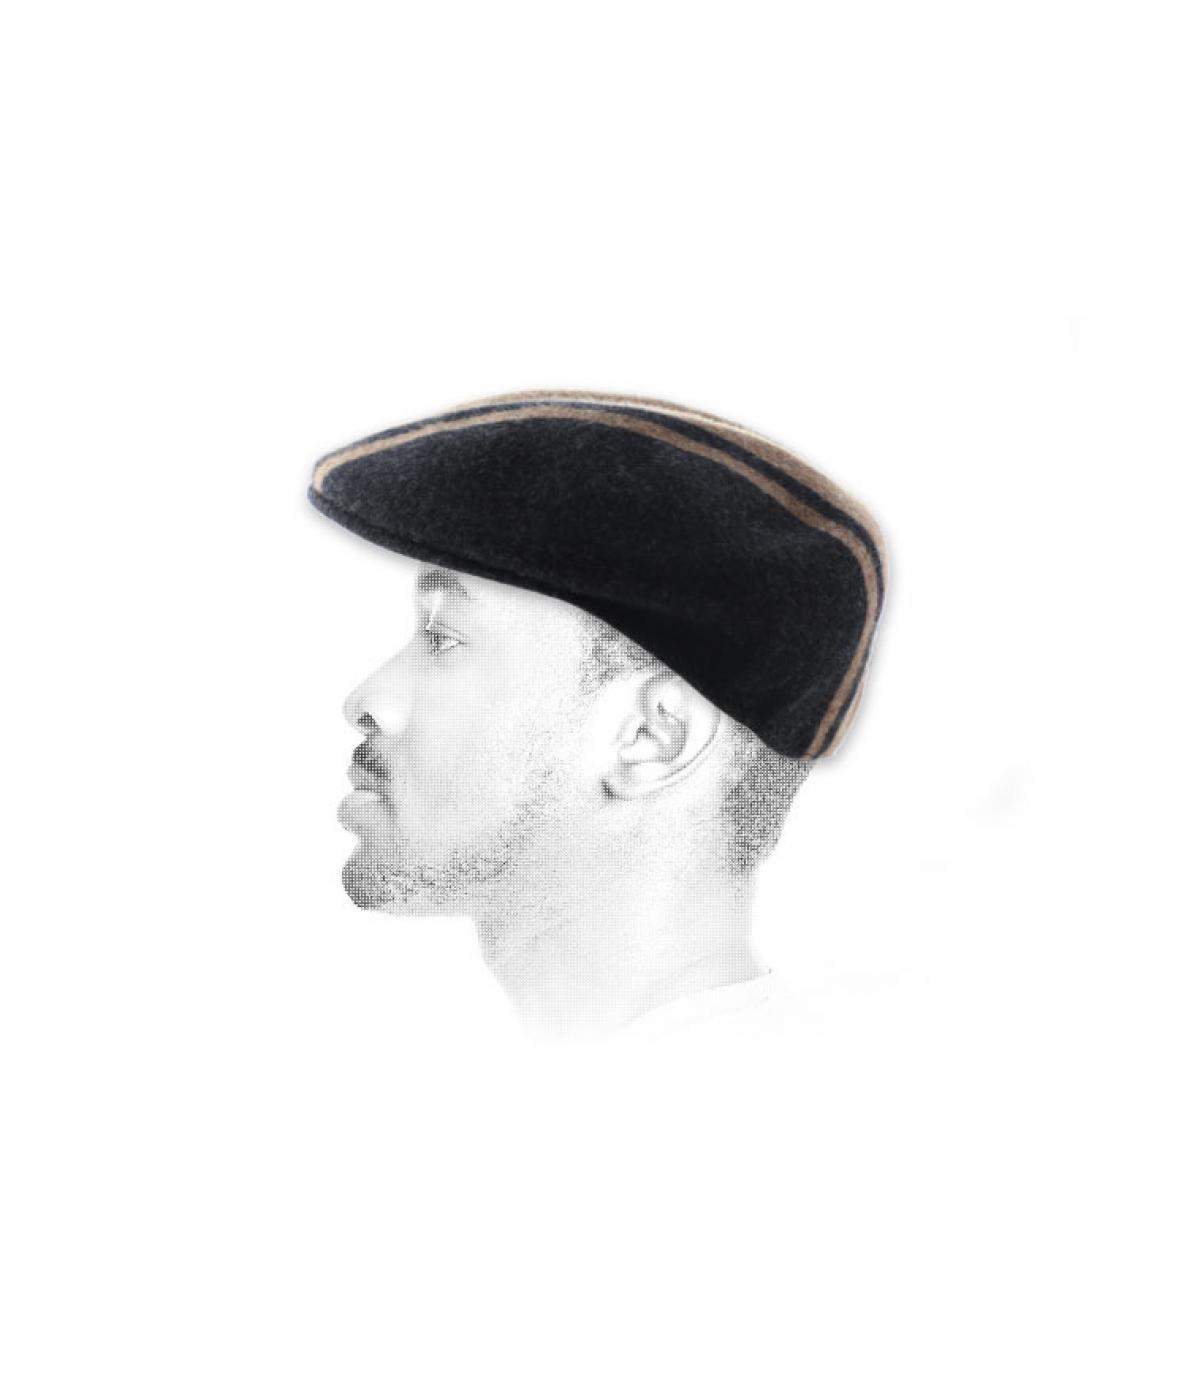 gorra 504 Kangol raya